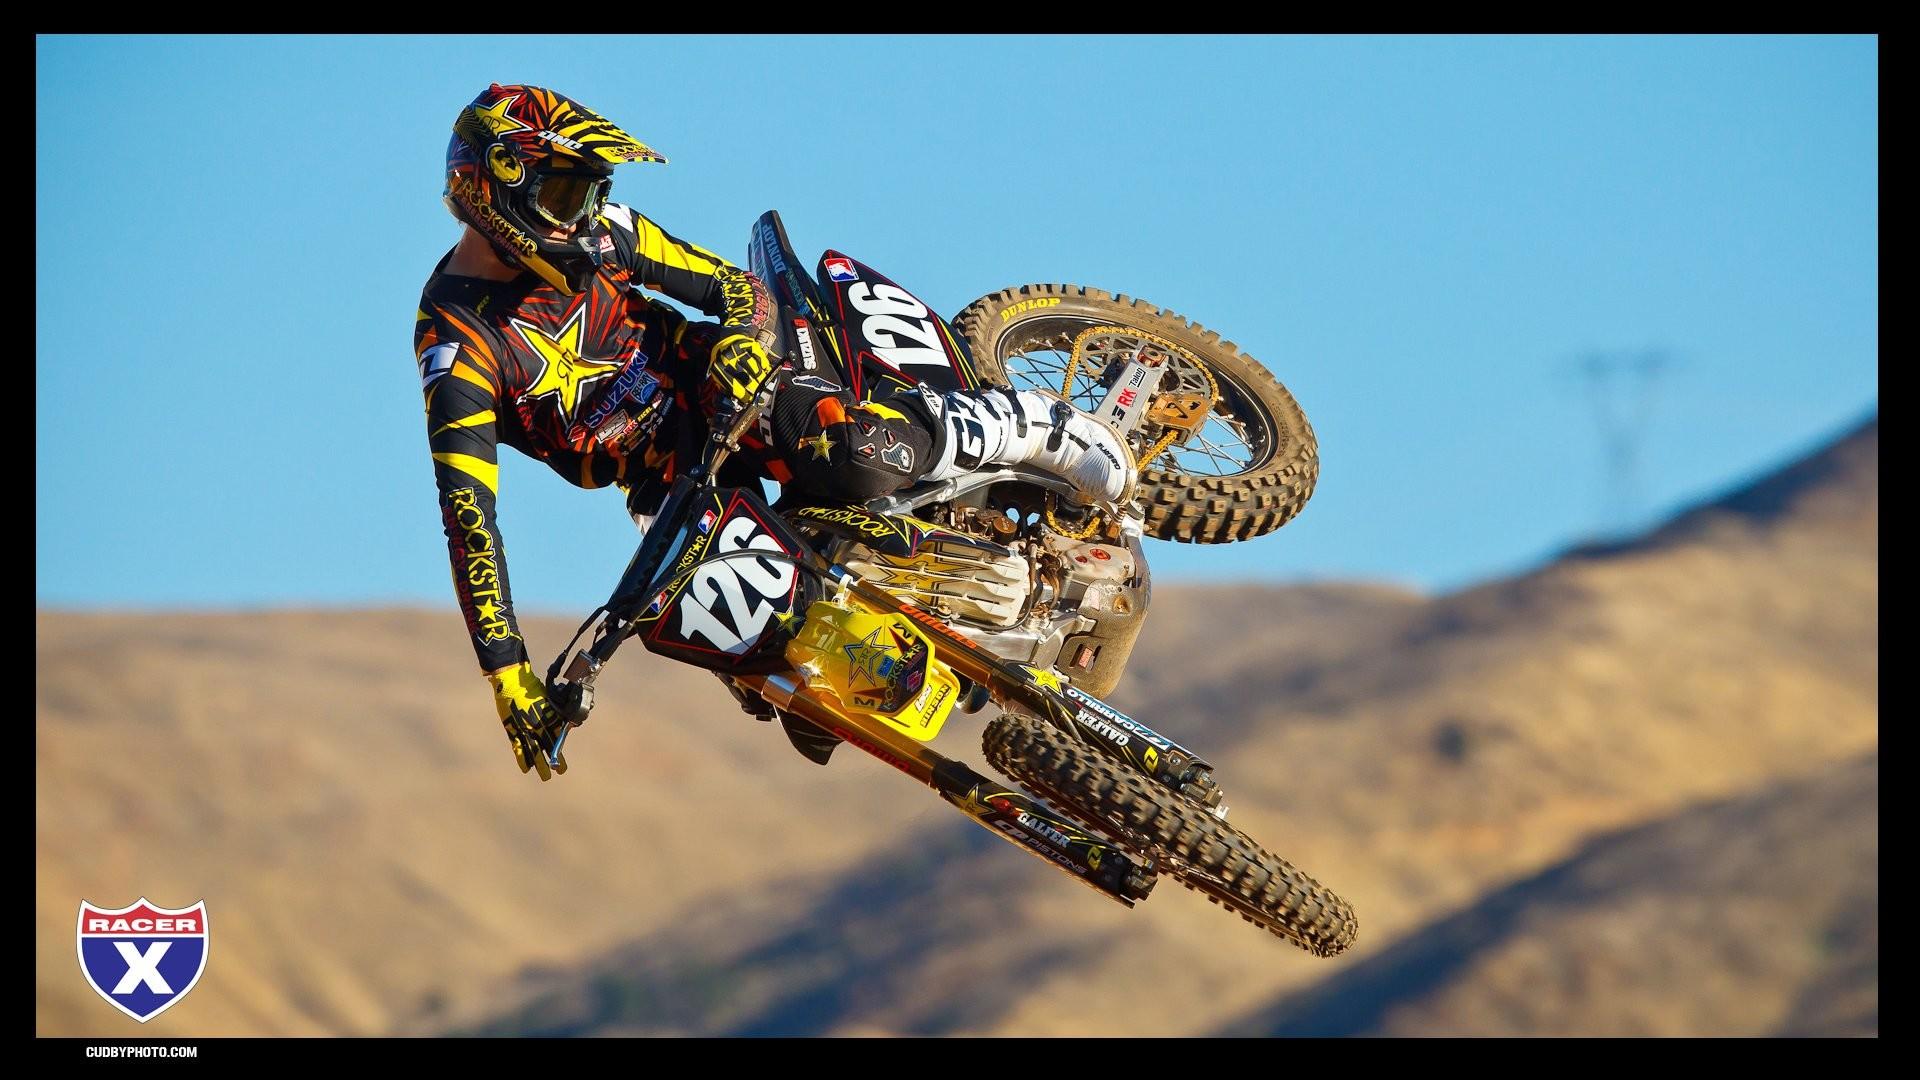 … Motocross HD Wallpaper 0 HTML code. Rockstar Energy Racing Wallpapers –  Racer X Online